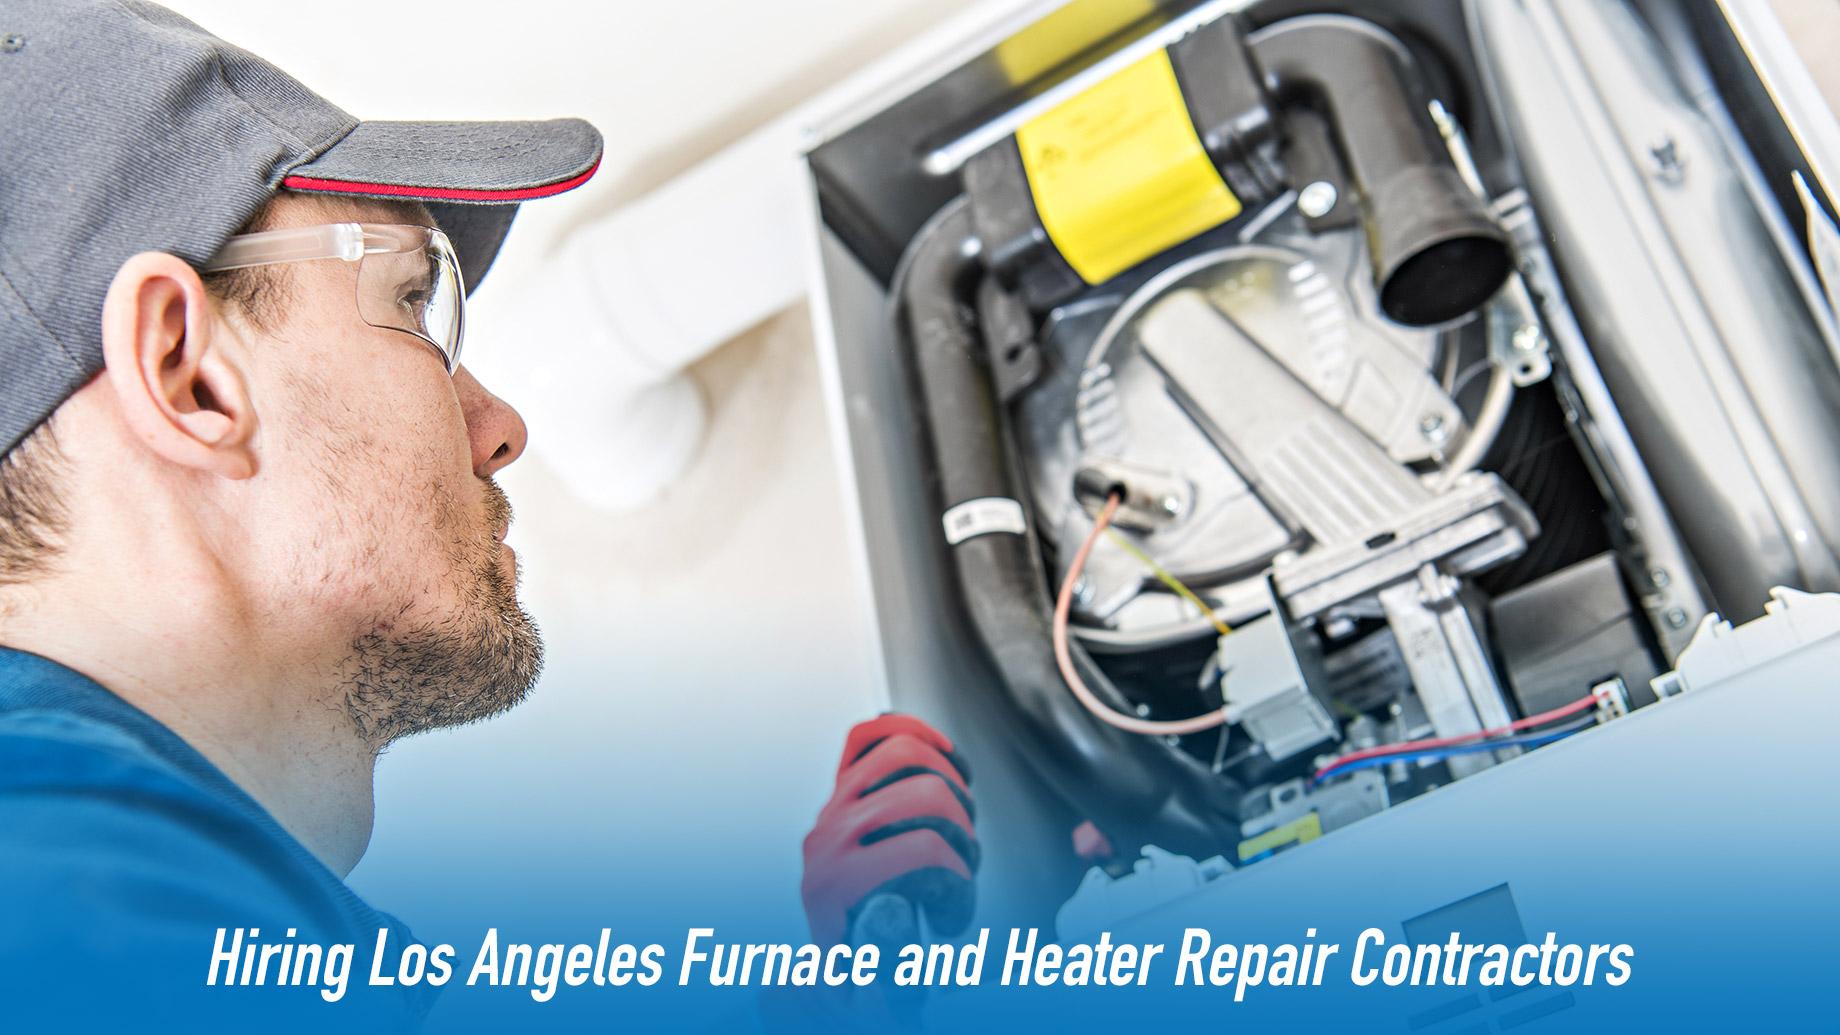 Hiring Los Angeles, CA Furnace and Heater Repair Contractors